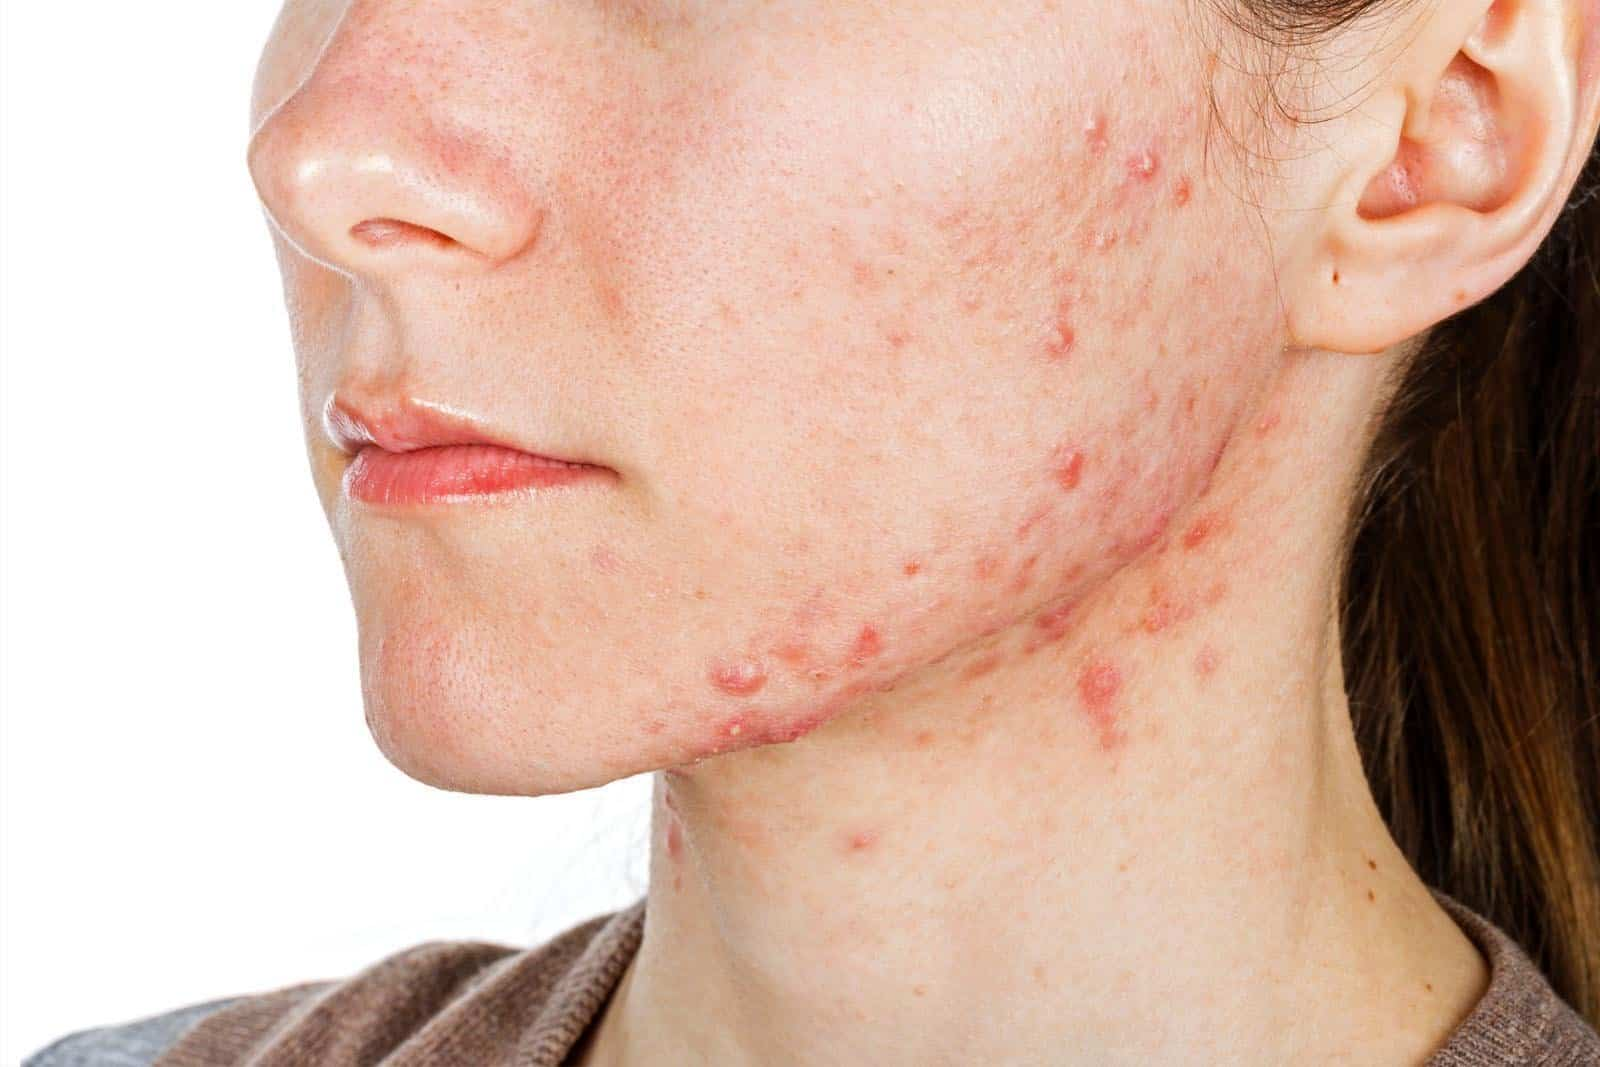 http://alamoheightswellness.com/naet-allergy-elimination/